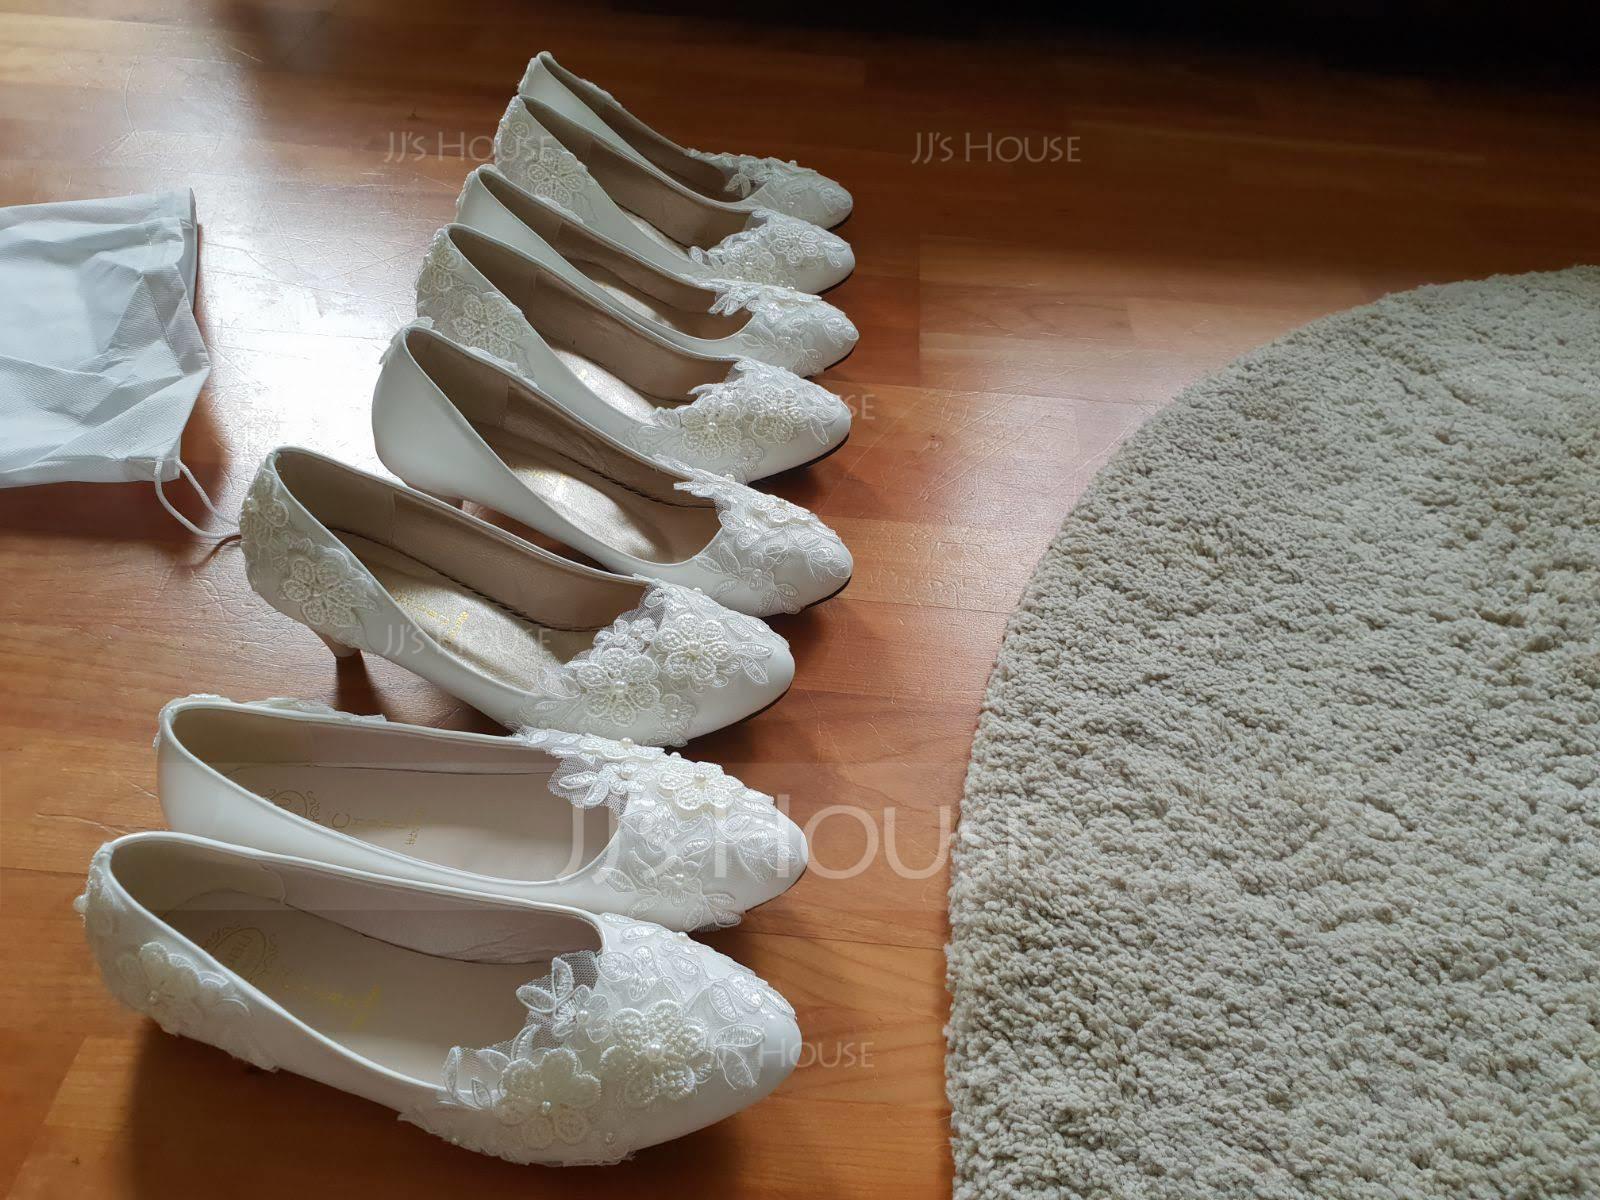 Women's Lace Leatherette Stiletto Heel Closed Toe Pumps With Imitation Pearl Applique (047132792)